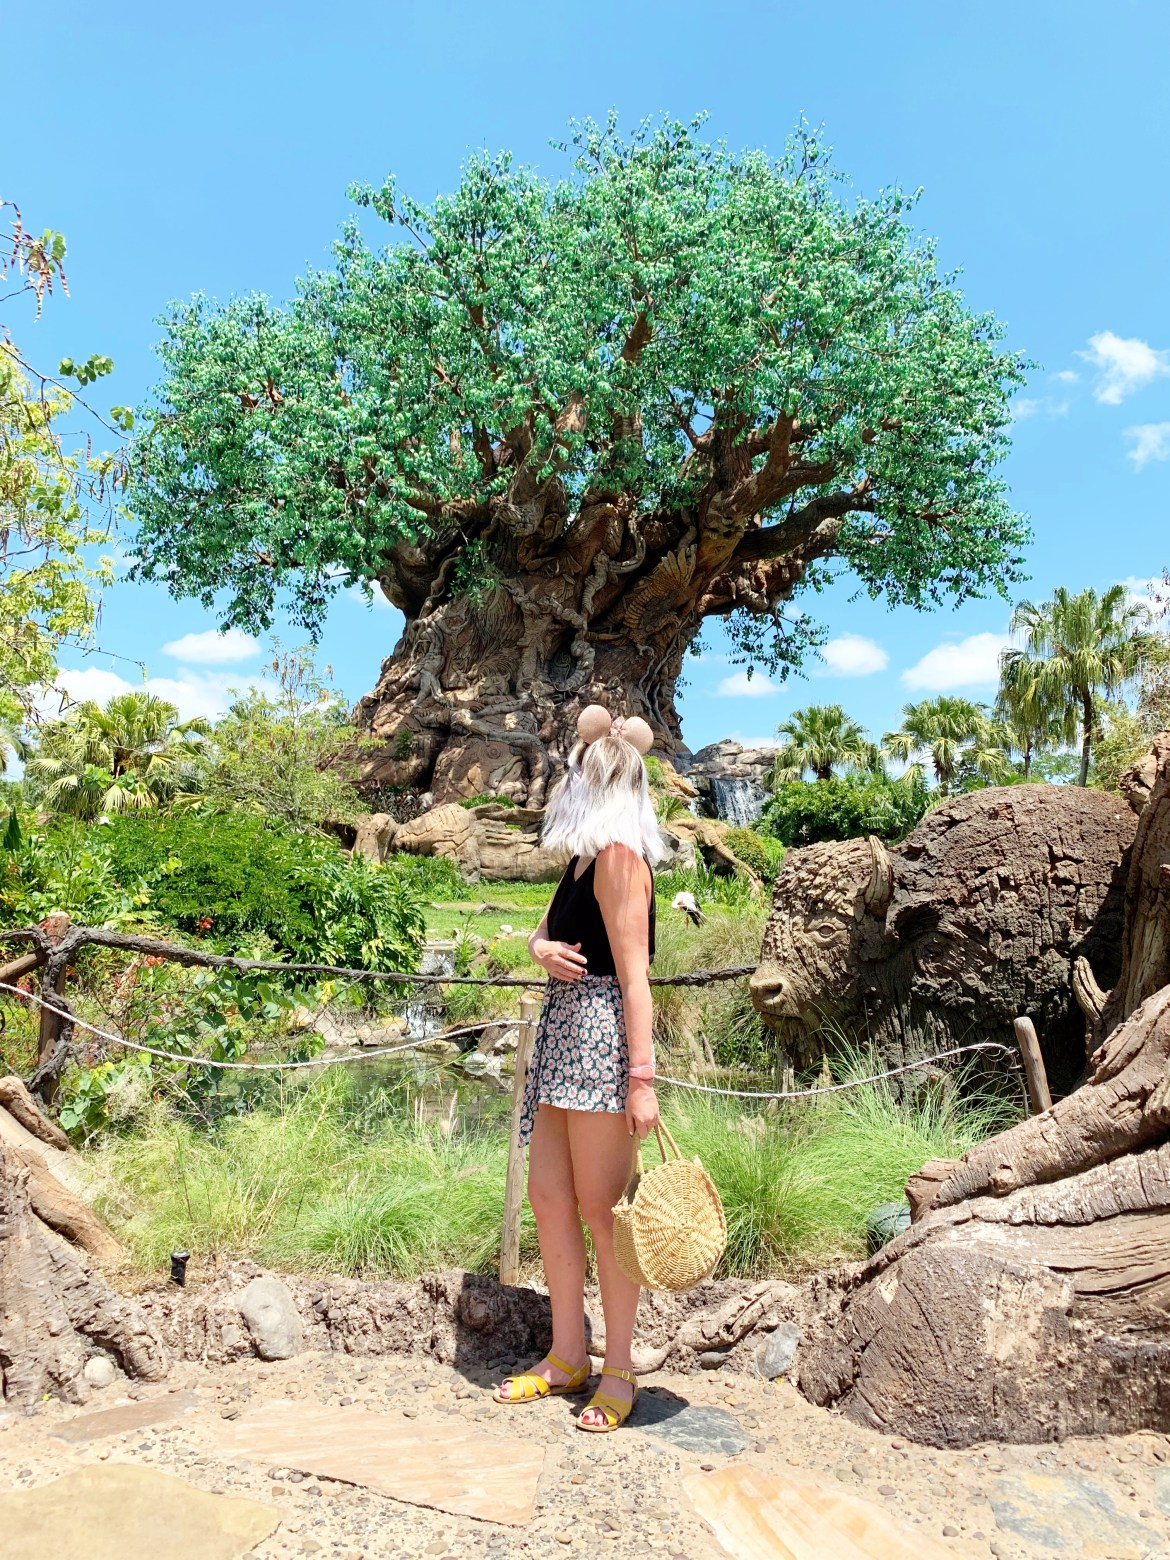 Instagram Walls of Walt Disney World